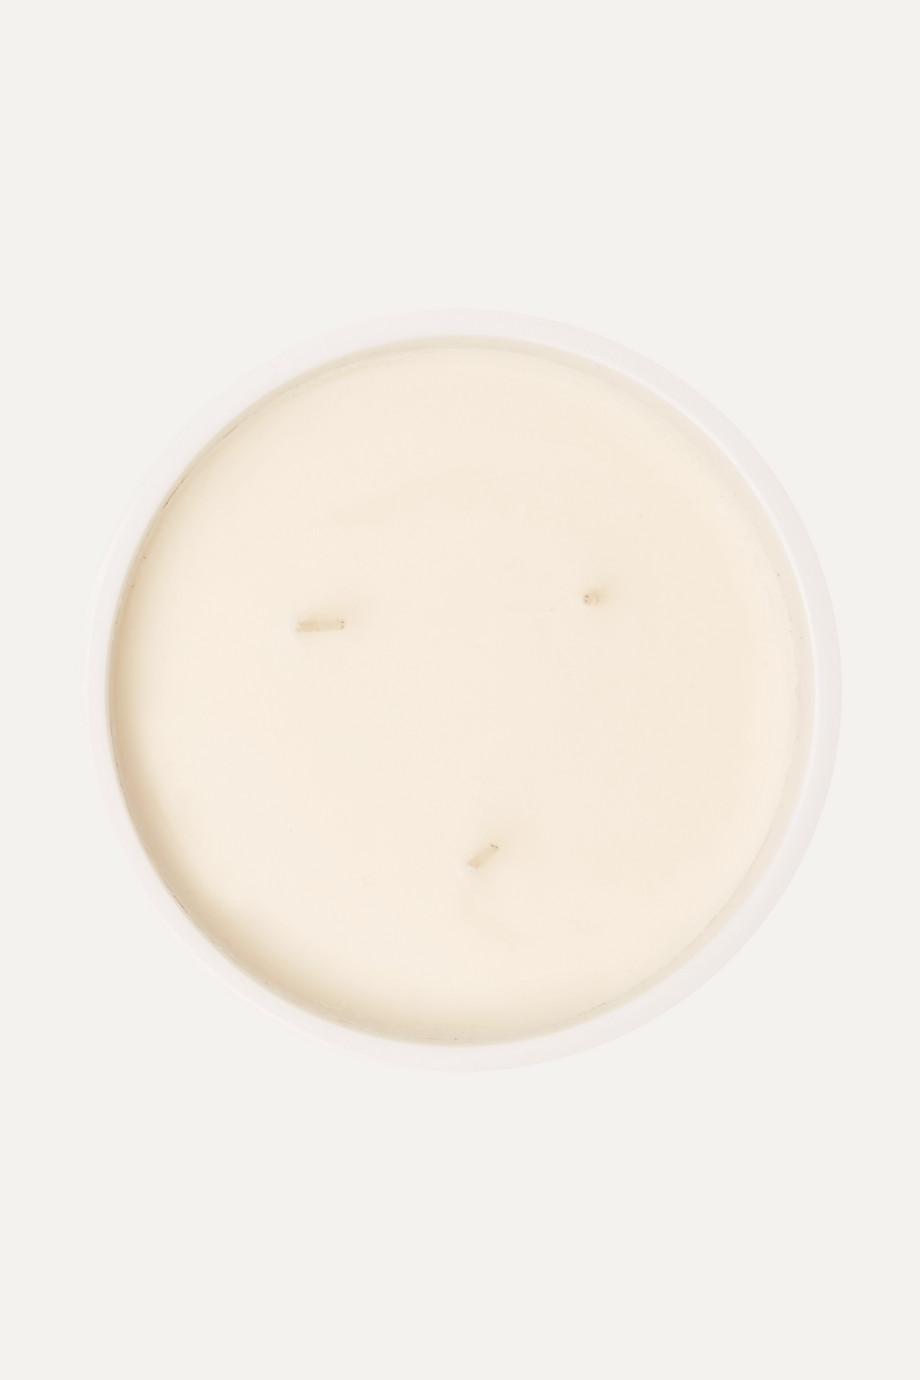 Fornasetti Aperitivo scented candle, 1.9kg